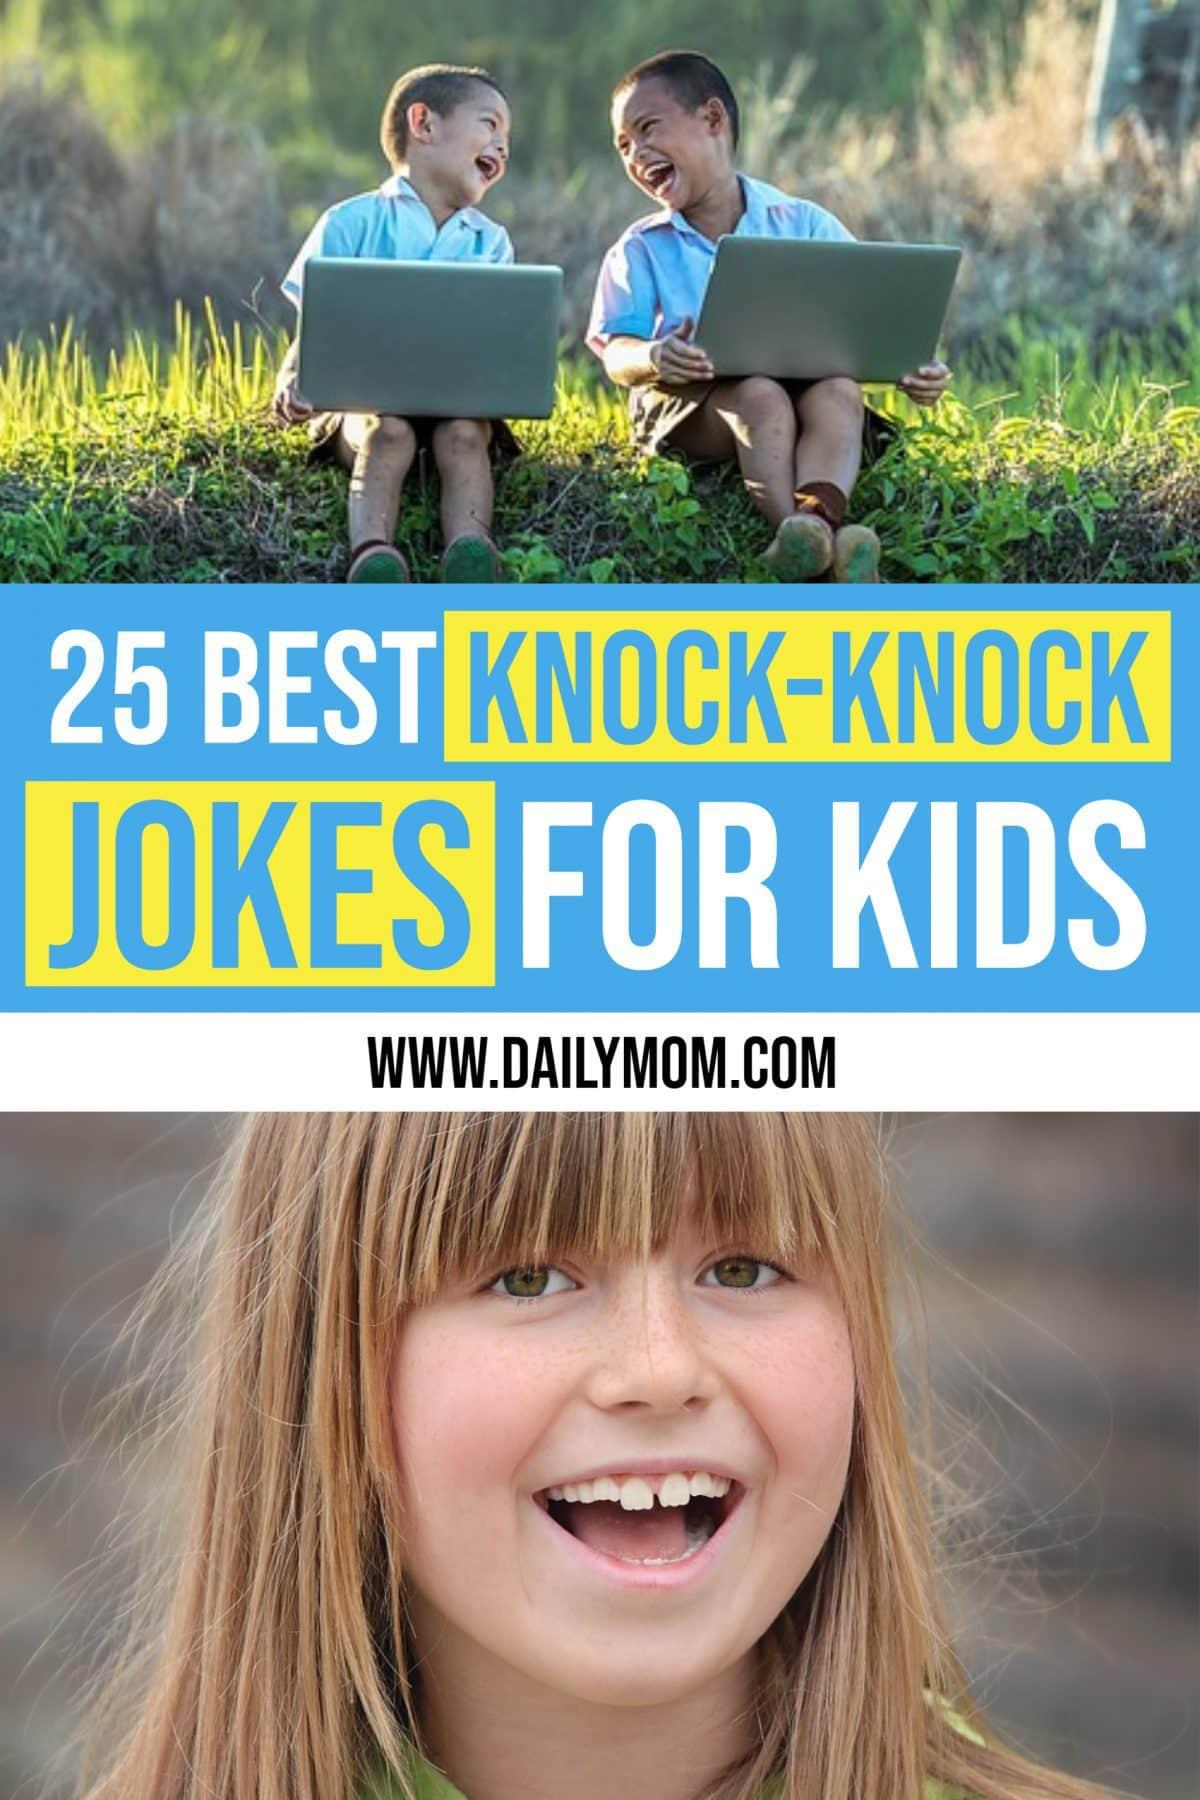 Daily Mom Parent Portal Knock-Knock Jokes